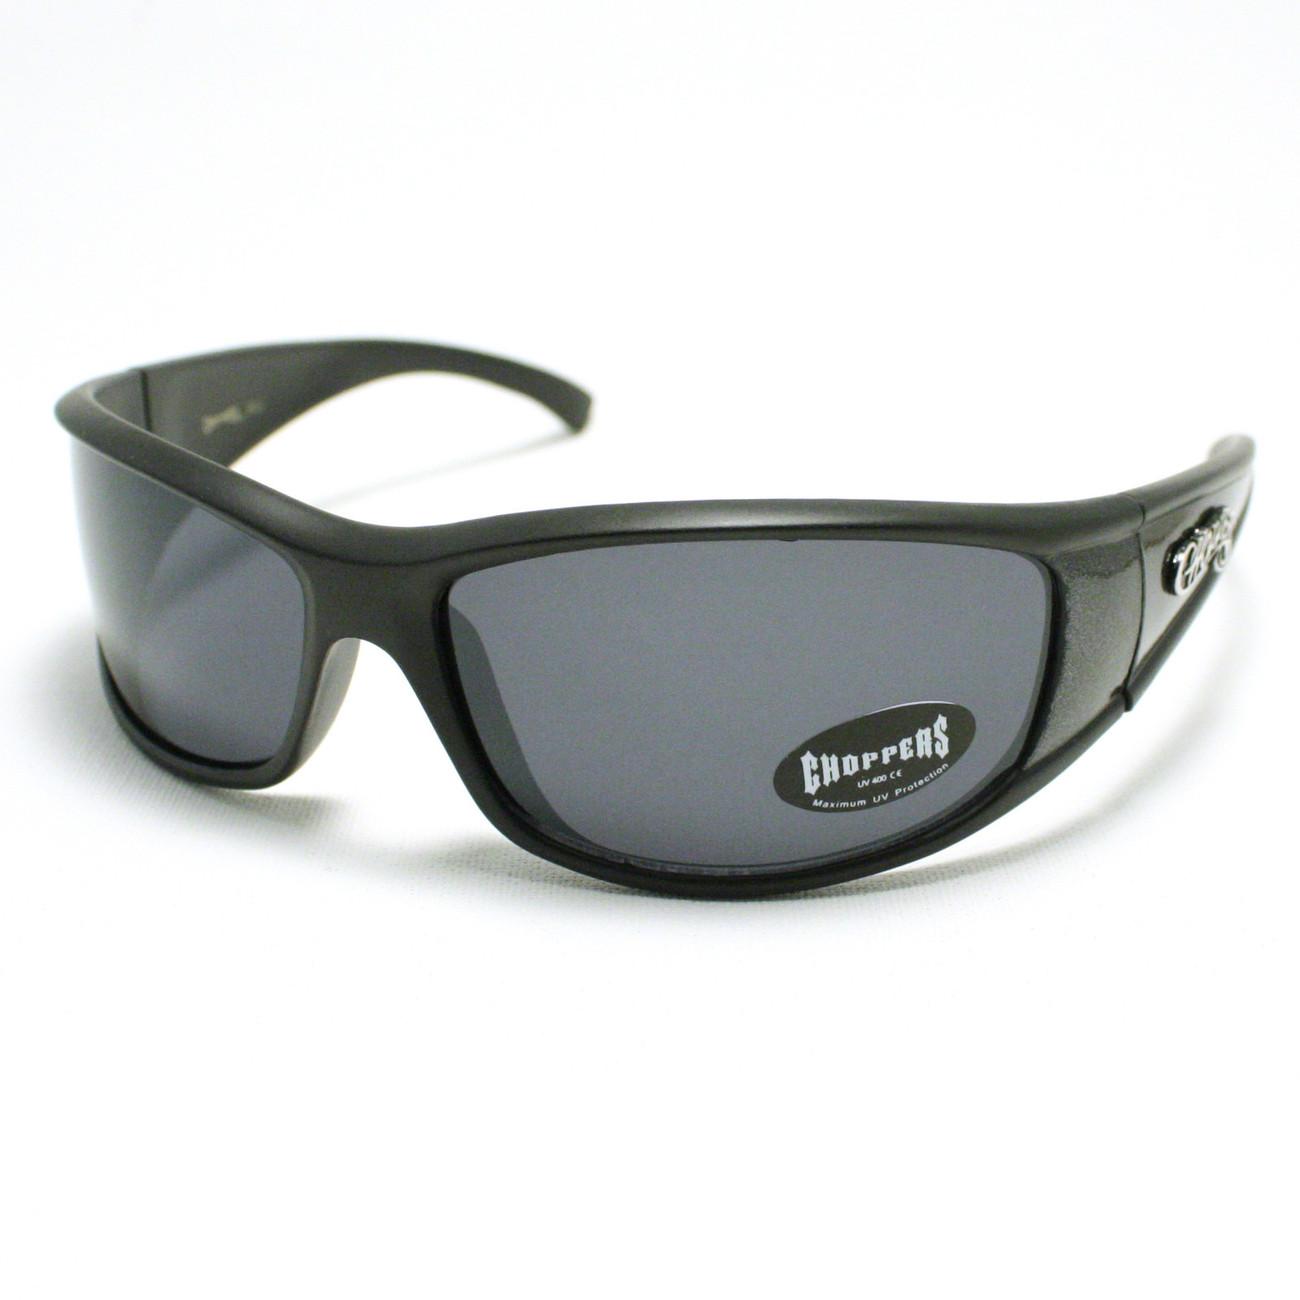 4d698e73e8d0 Choppers Sunglasses Uk